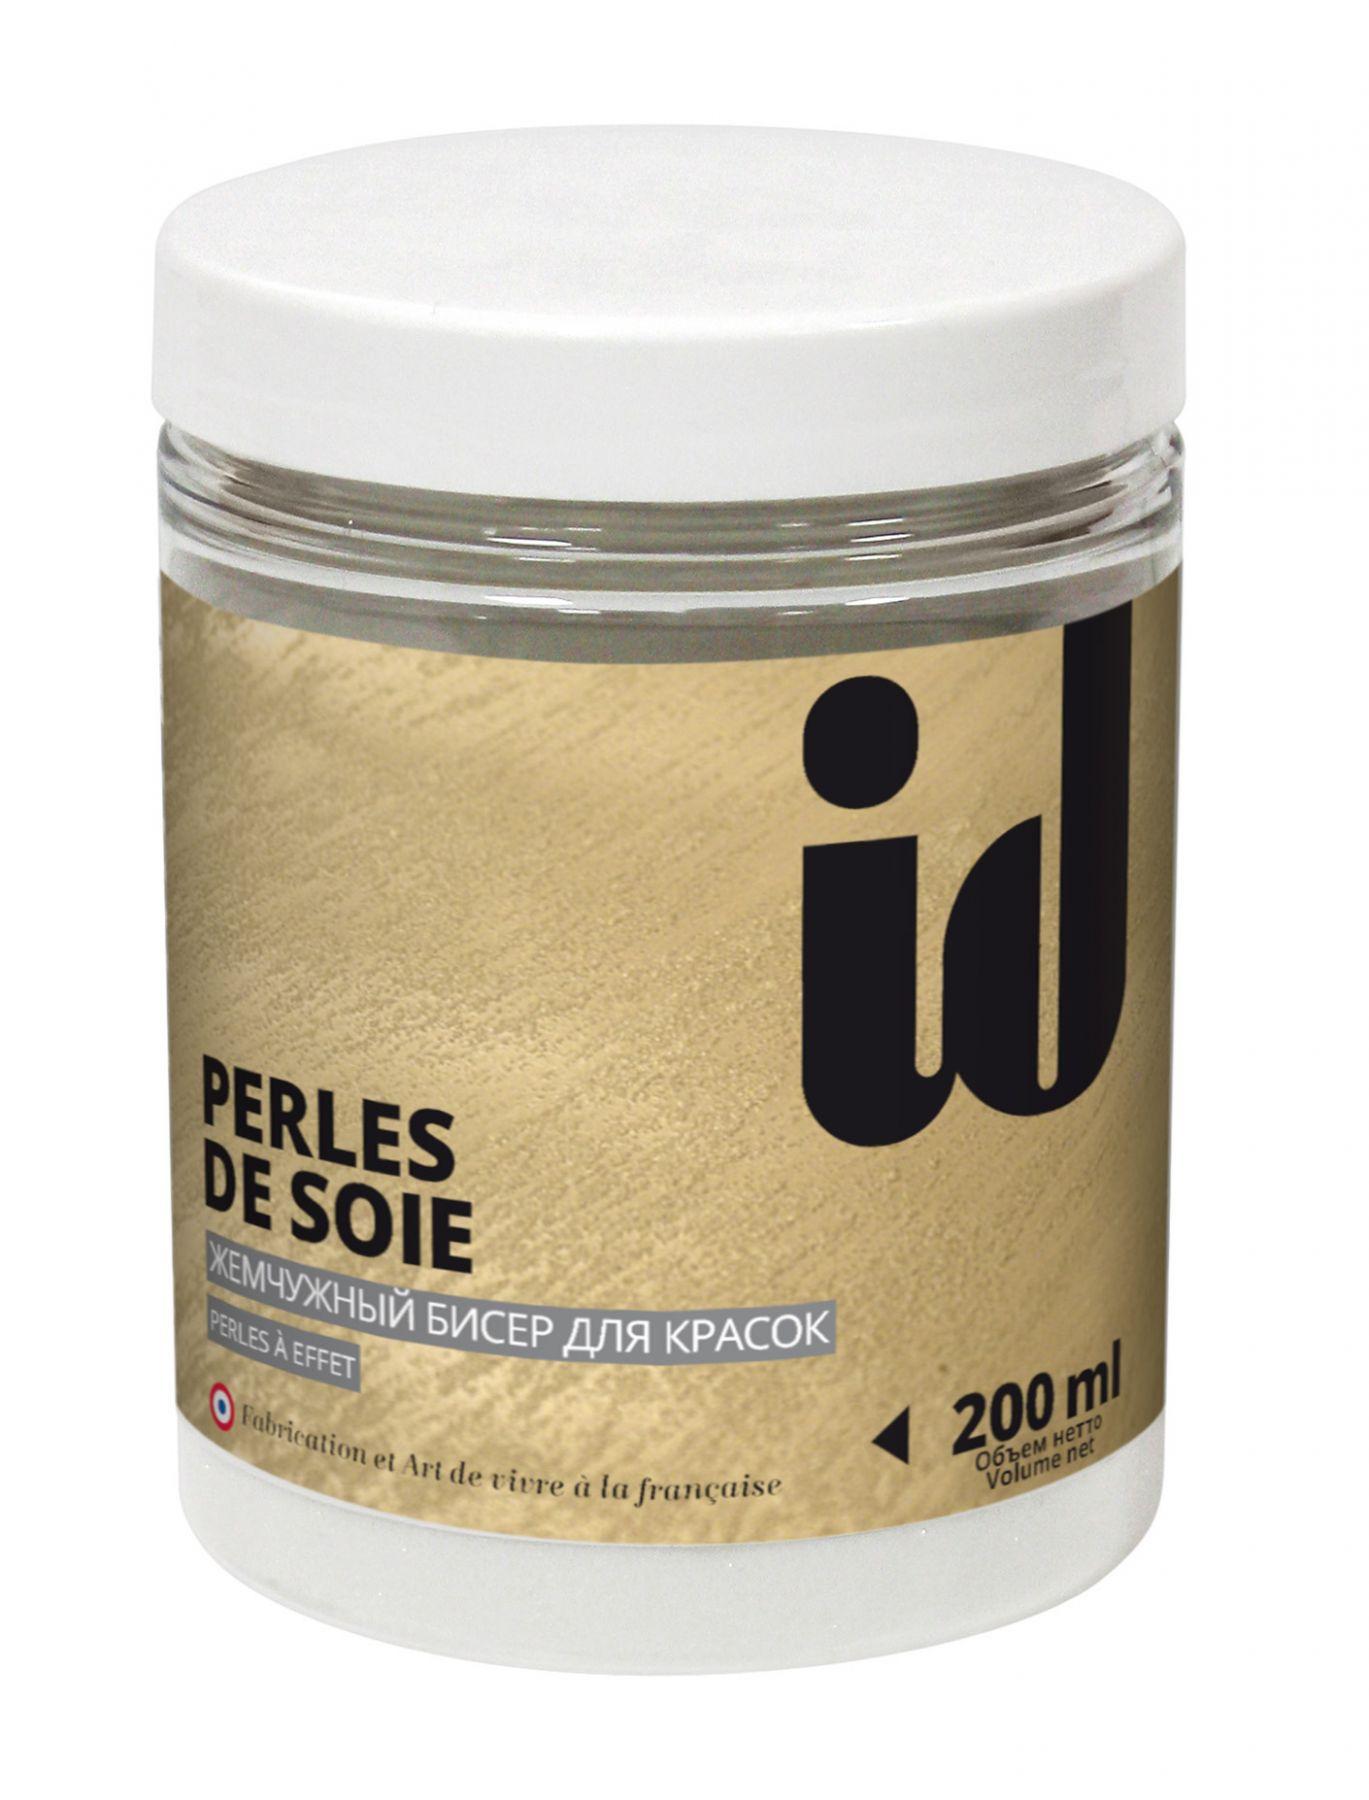 Стеклянные бусины Perle de Soie 200мл. ID0021